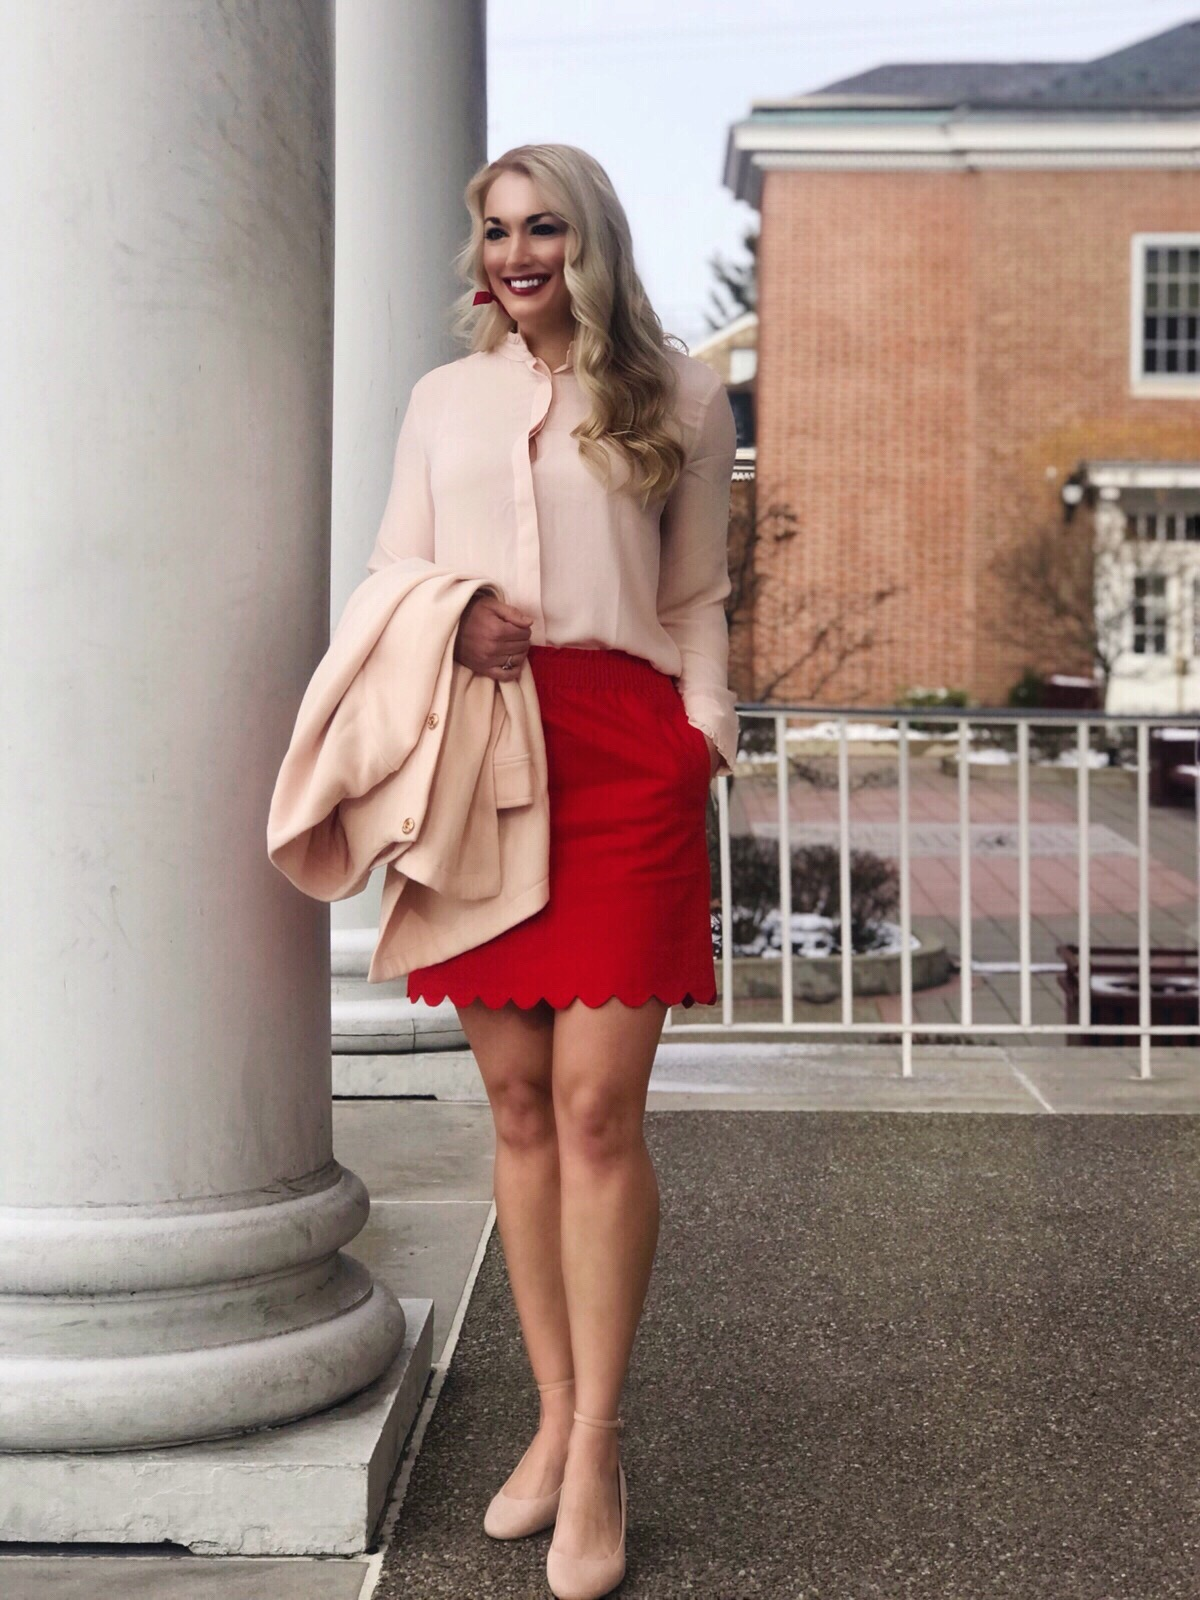 Scallop Hem Skirt | Blush Pink Blouse | Workwear | #workwear #classicstyle #preppy #fashion #style